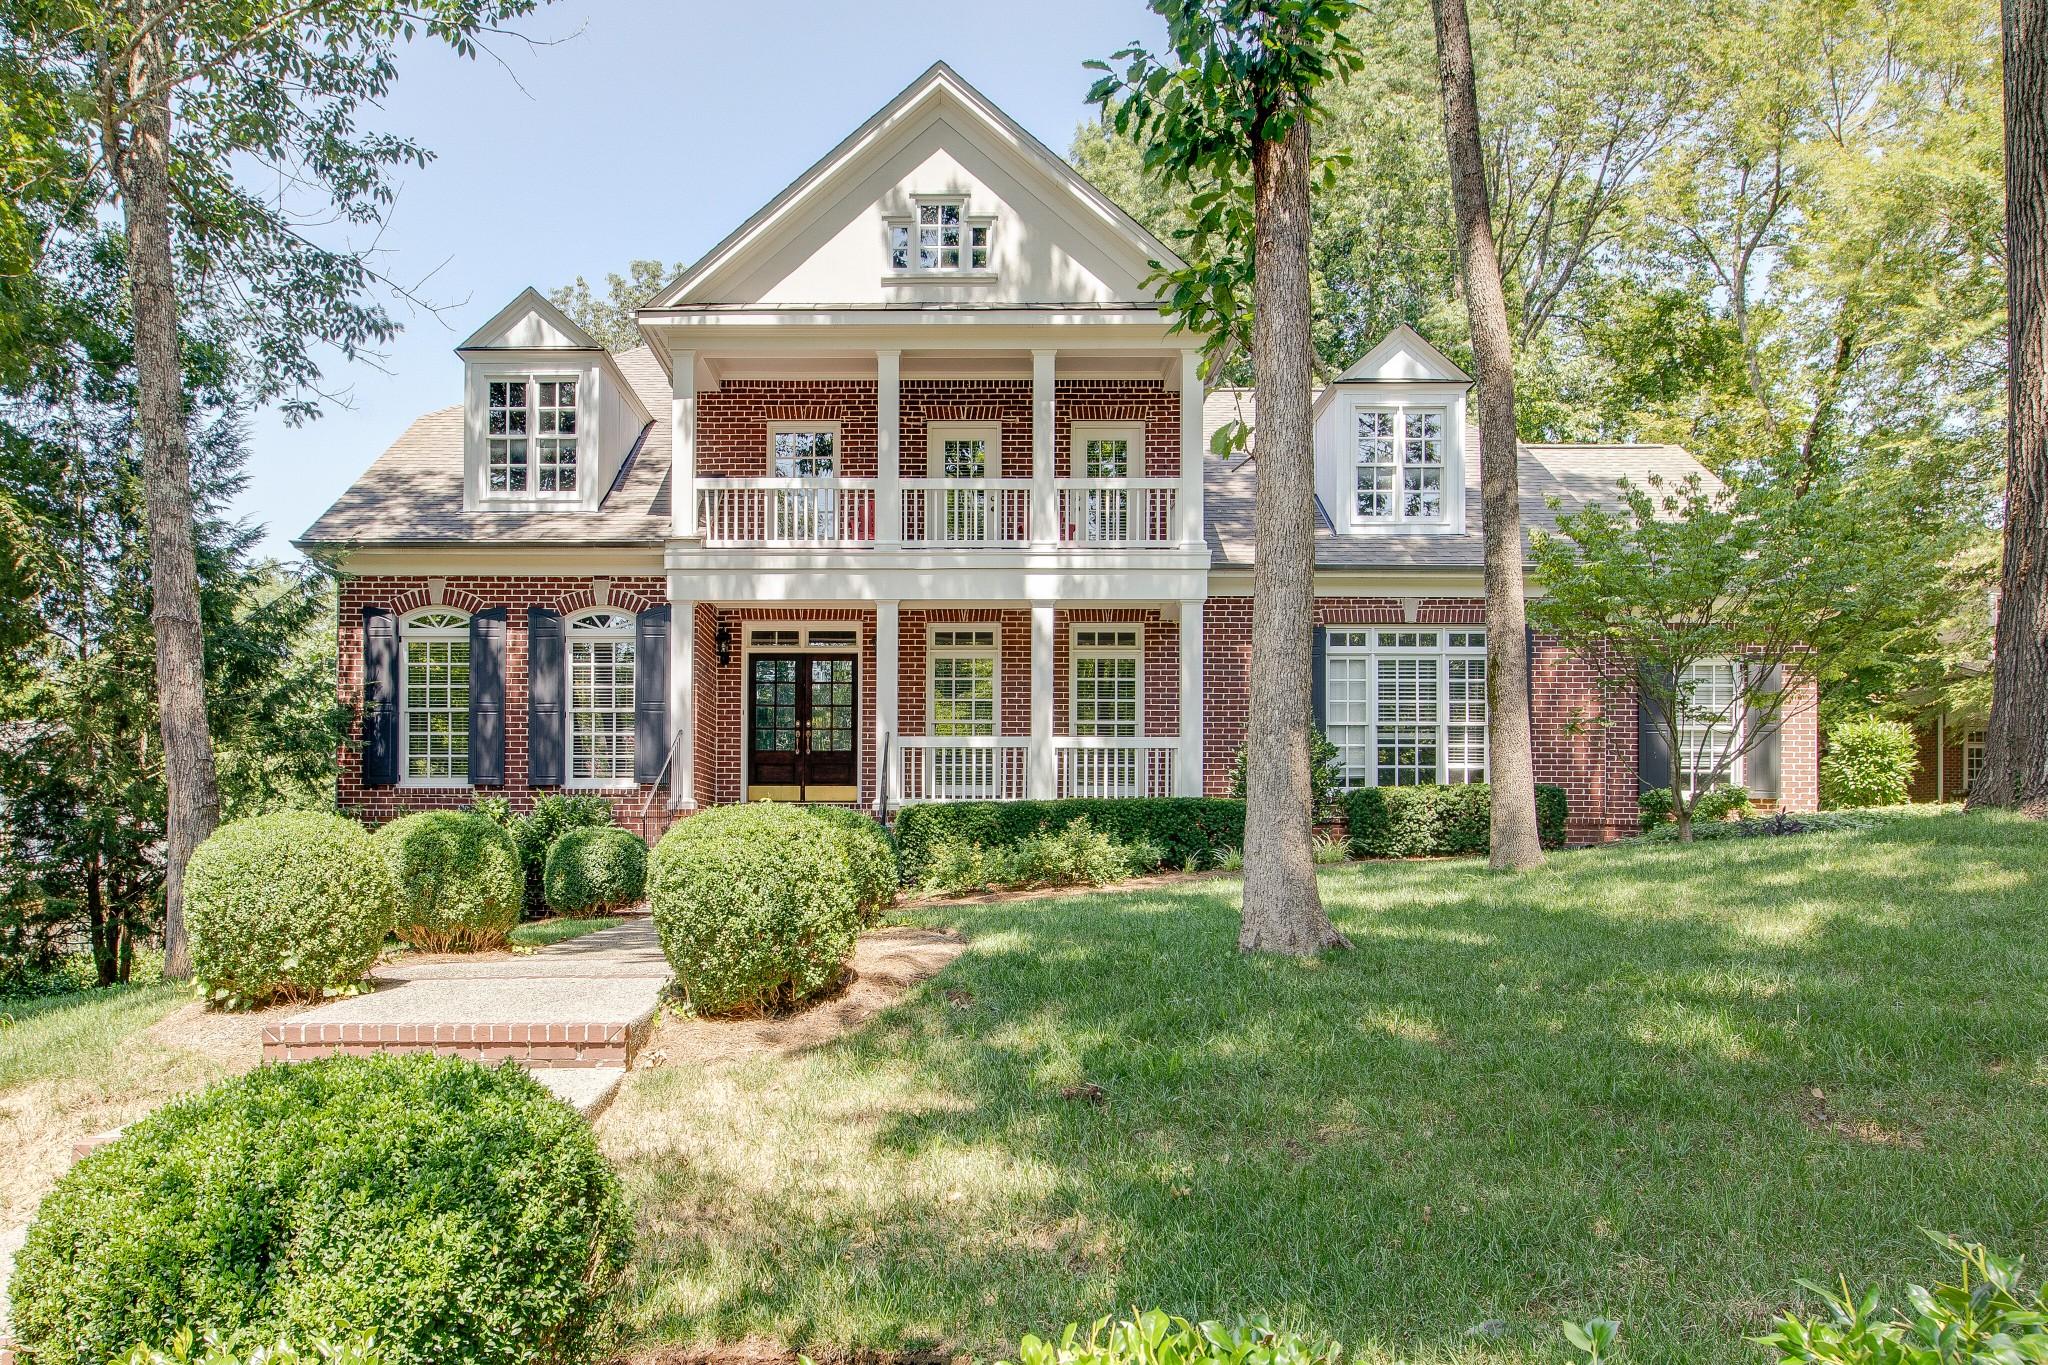 208 Bellegrove Ct Property Photo - Franklin, TN real estate listing